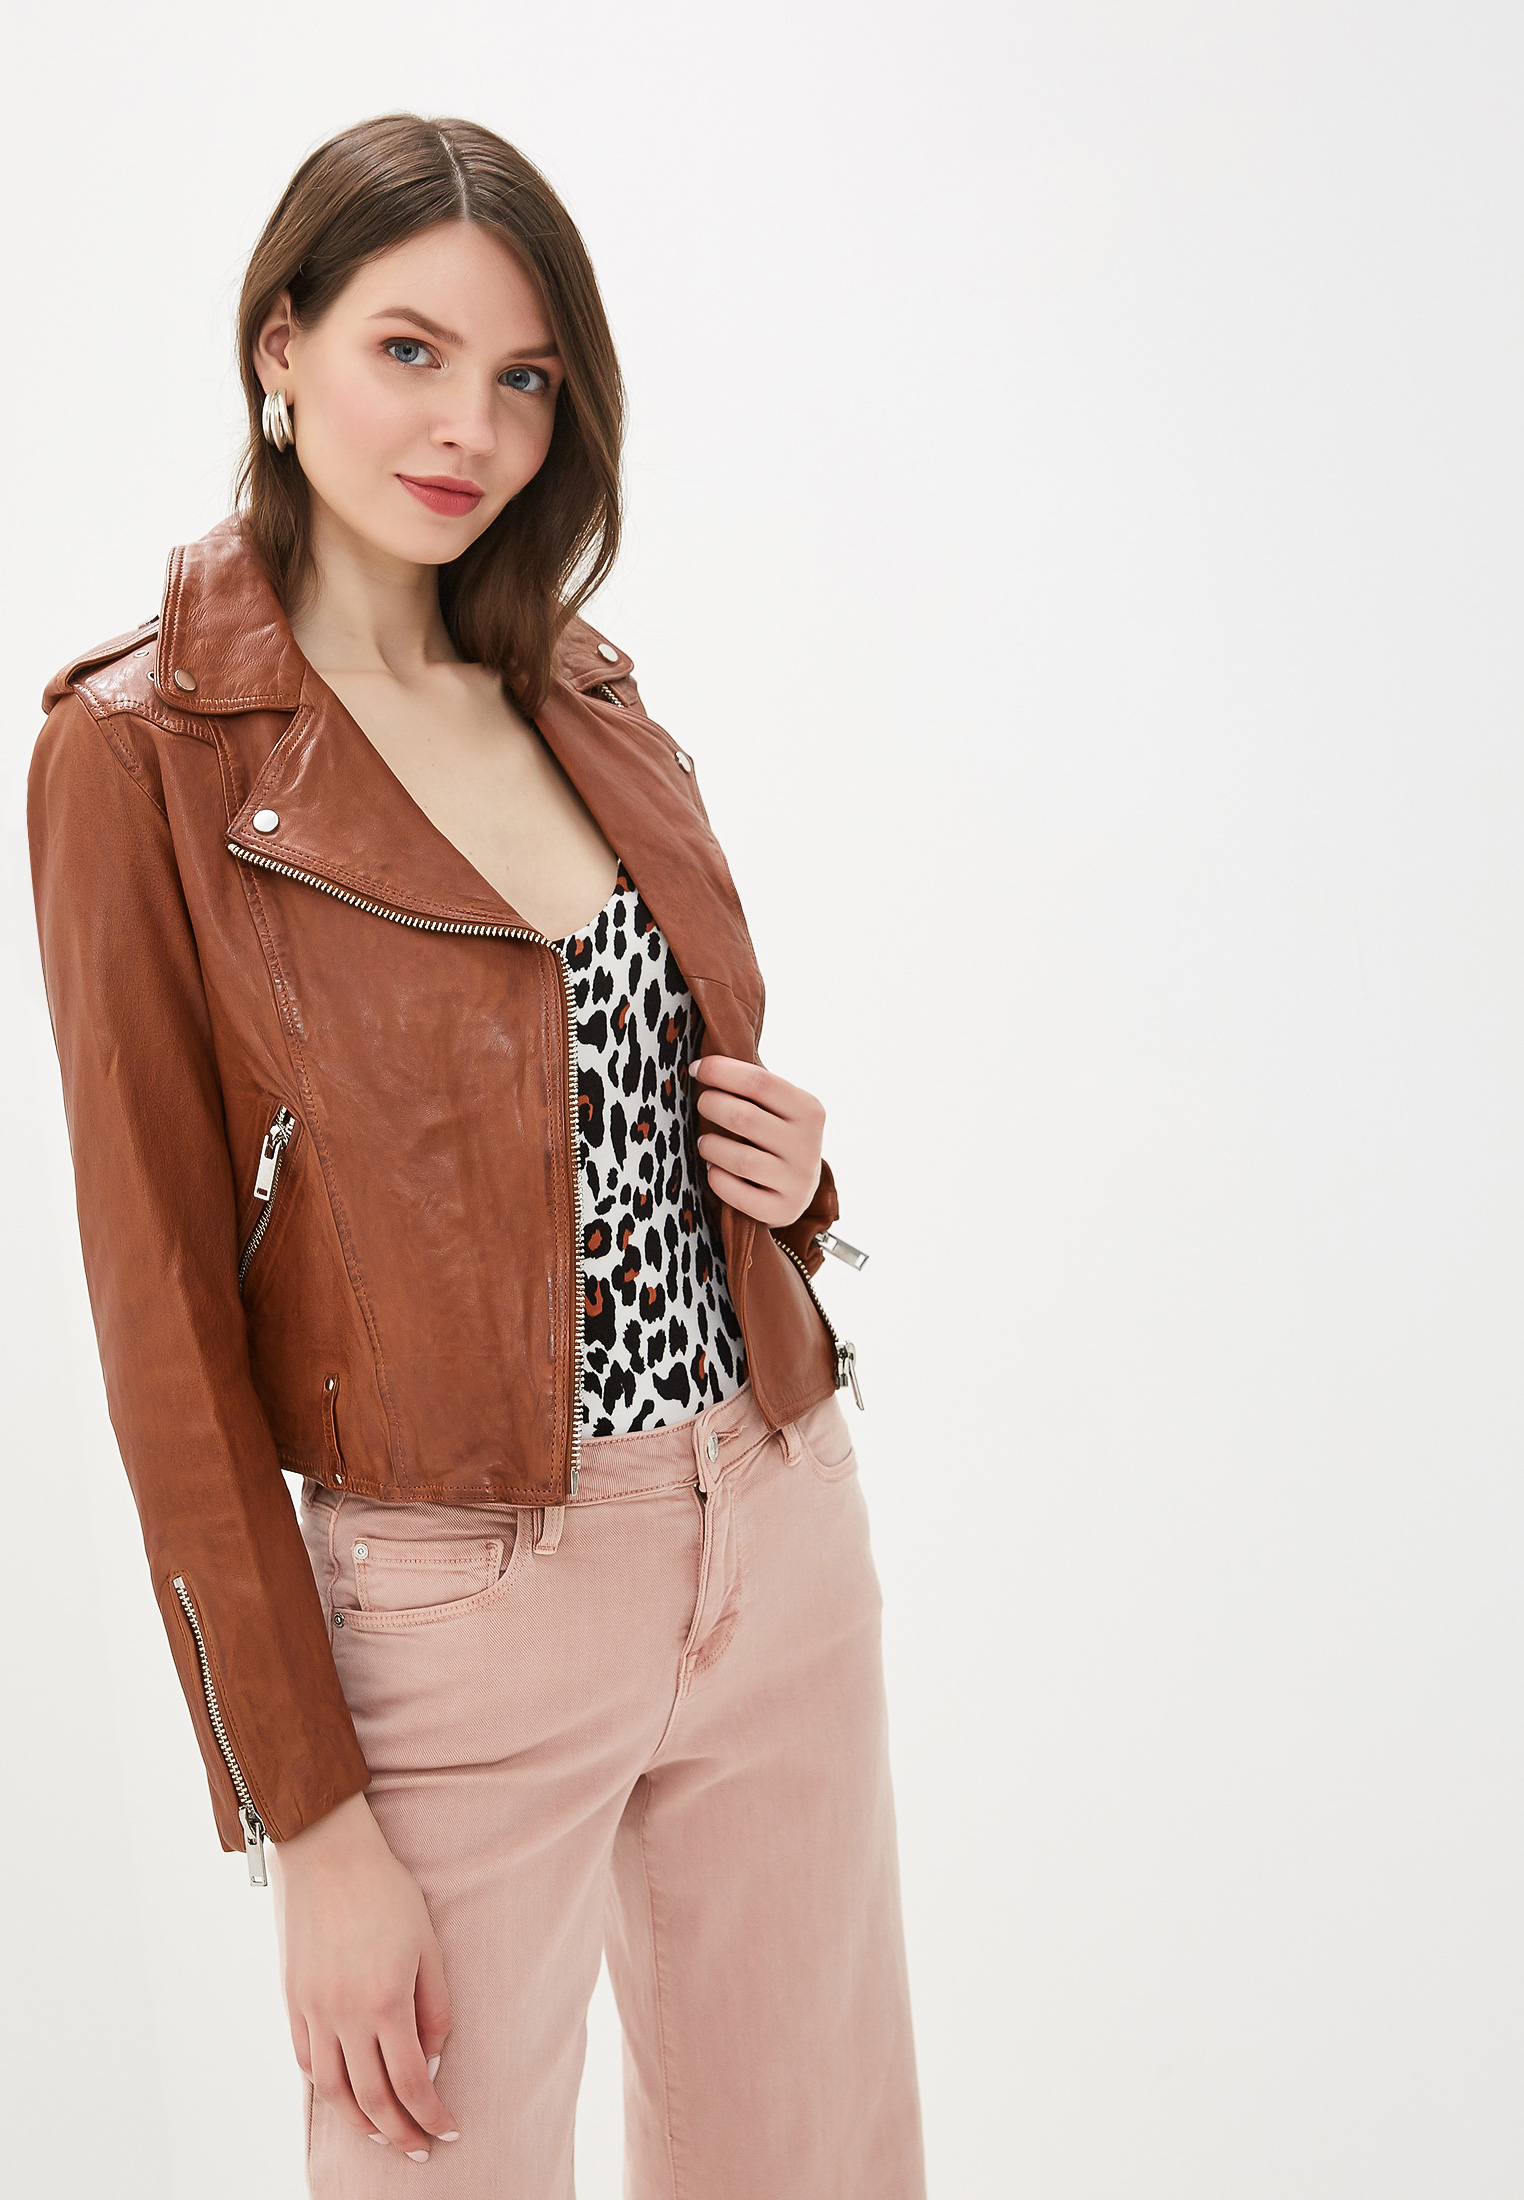 Куртка кожаная, La Reine Blanche, цвет: коричневый. Артикул: MP002XW0WNID. Одежда / Верхняя одежда / Косухи